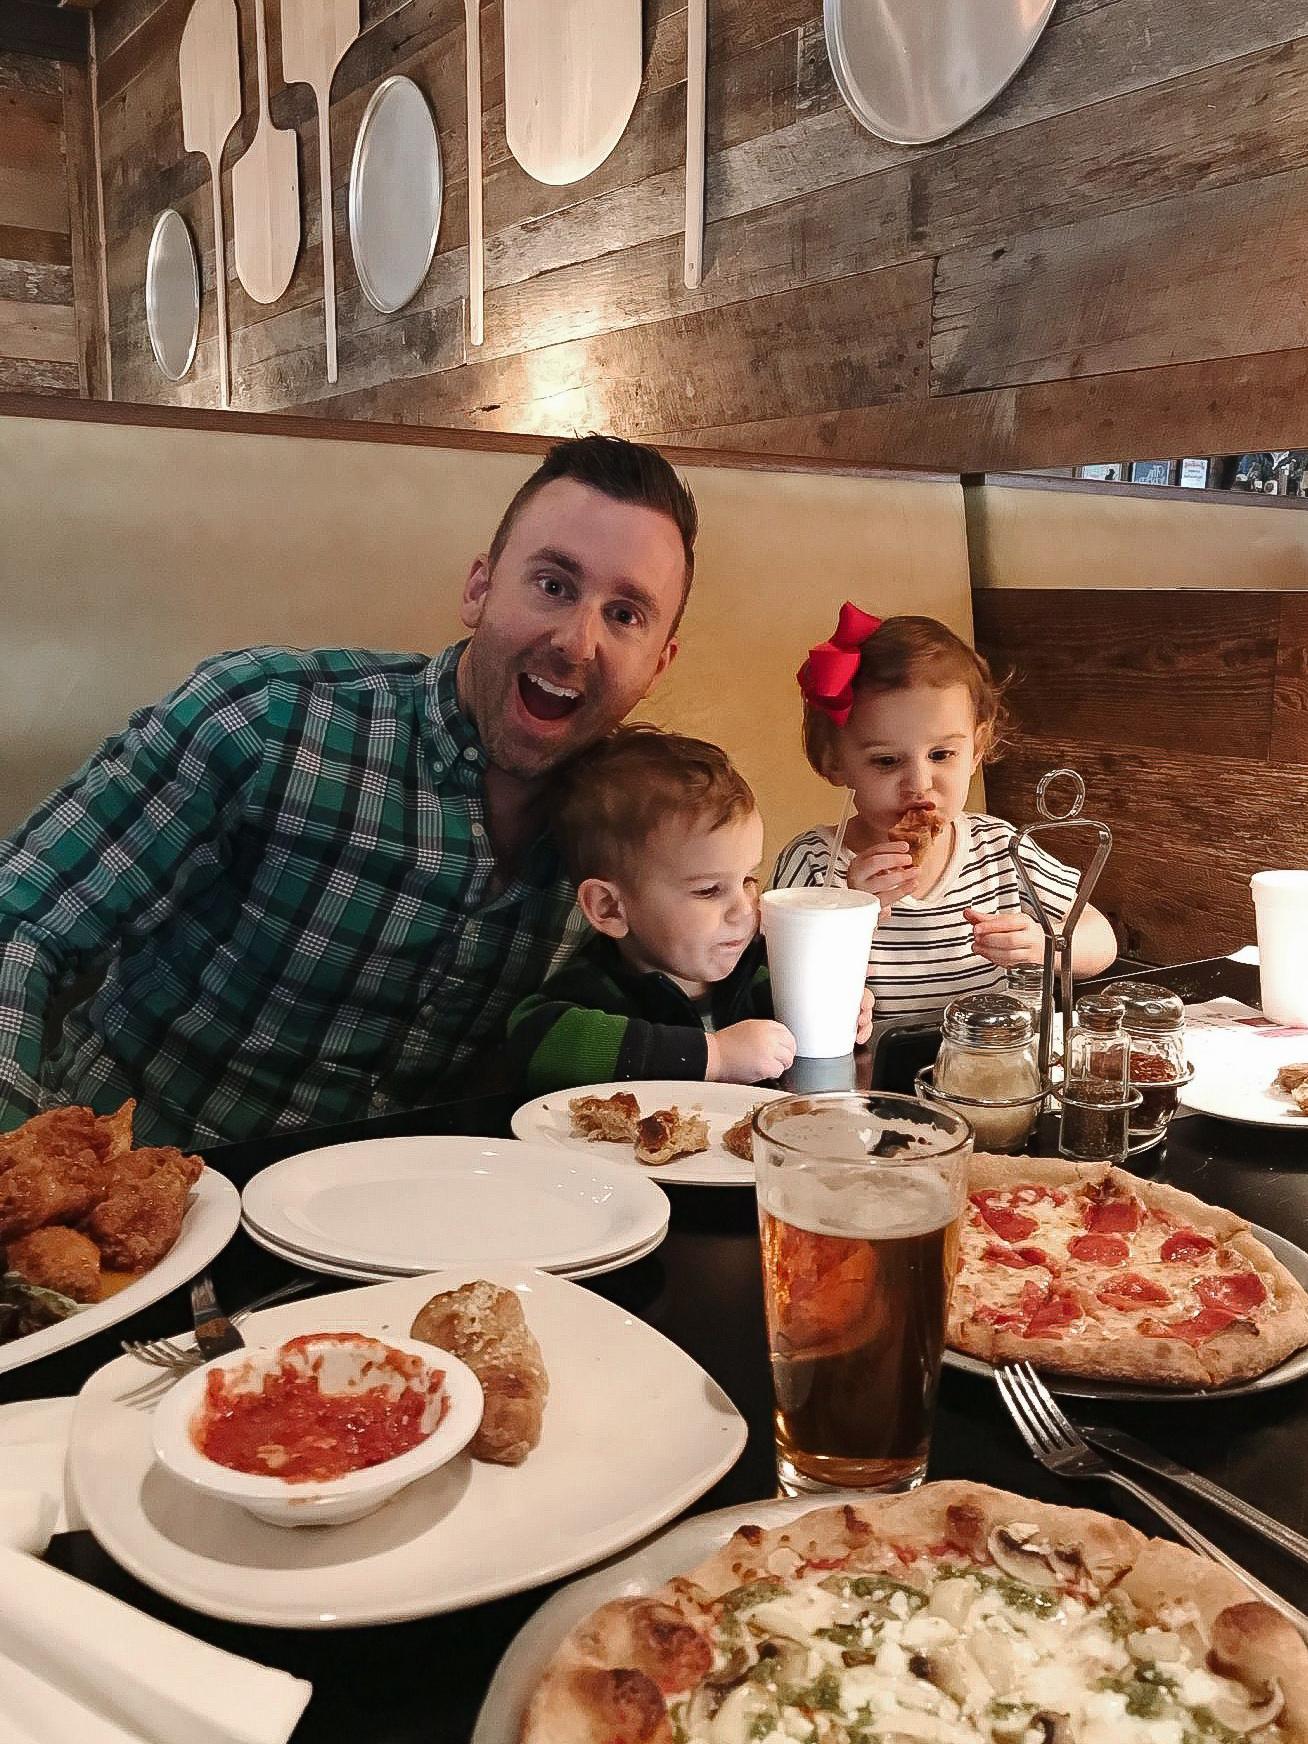 Dinner at Pizza Peel